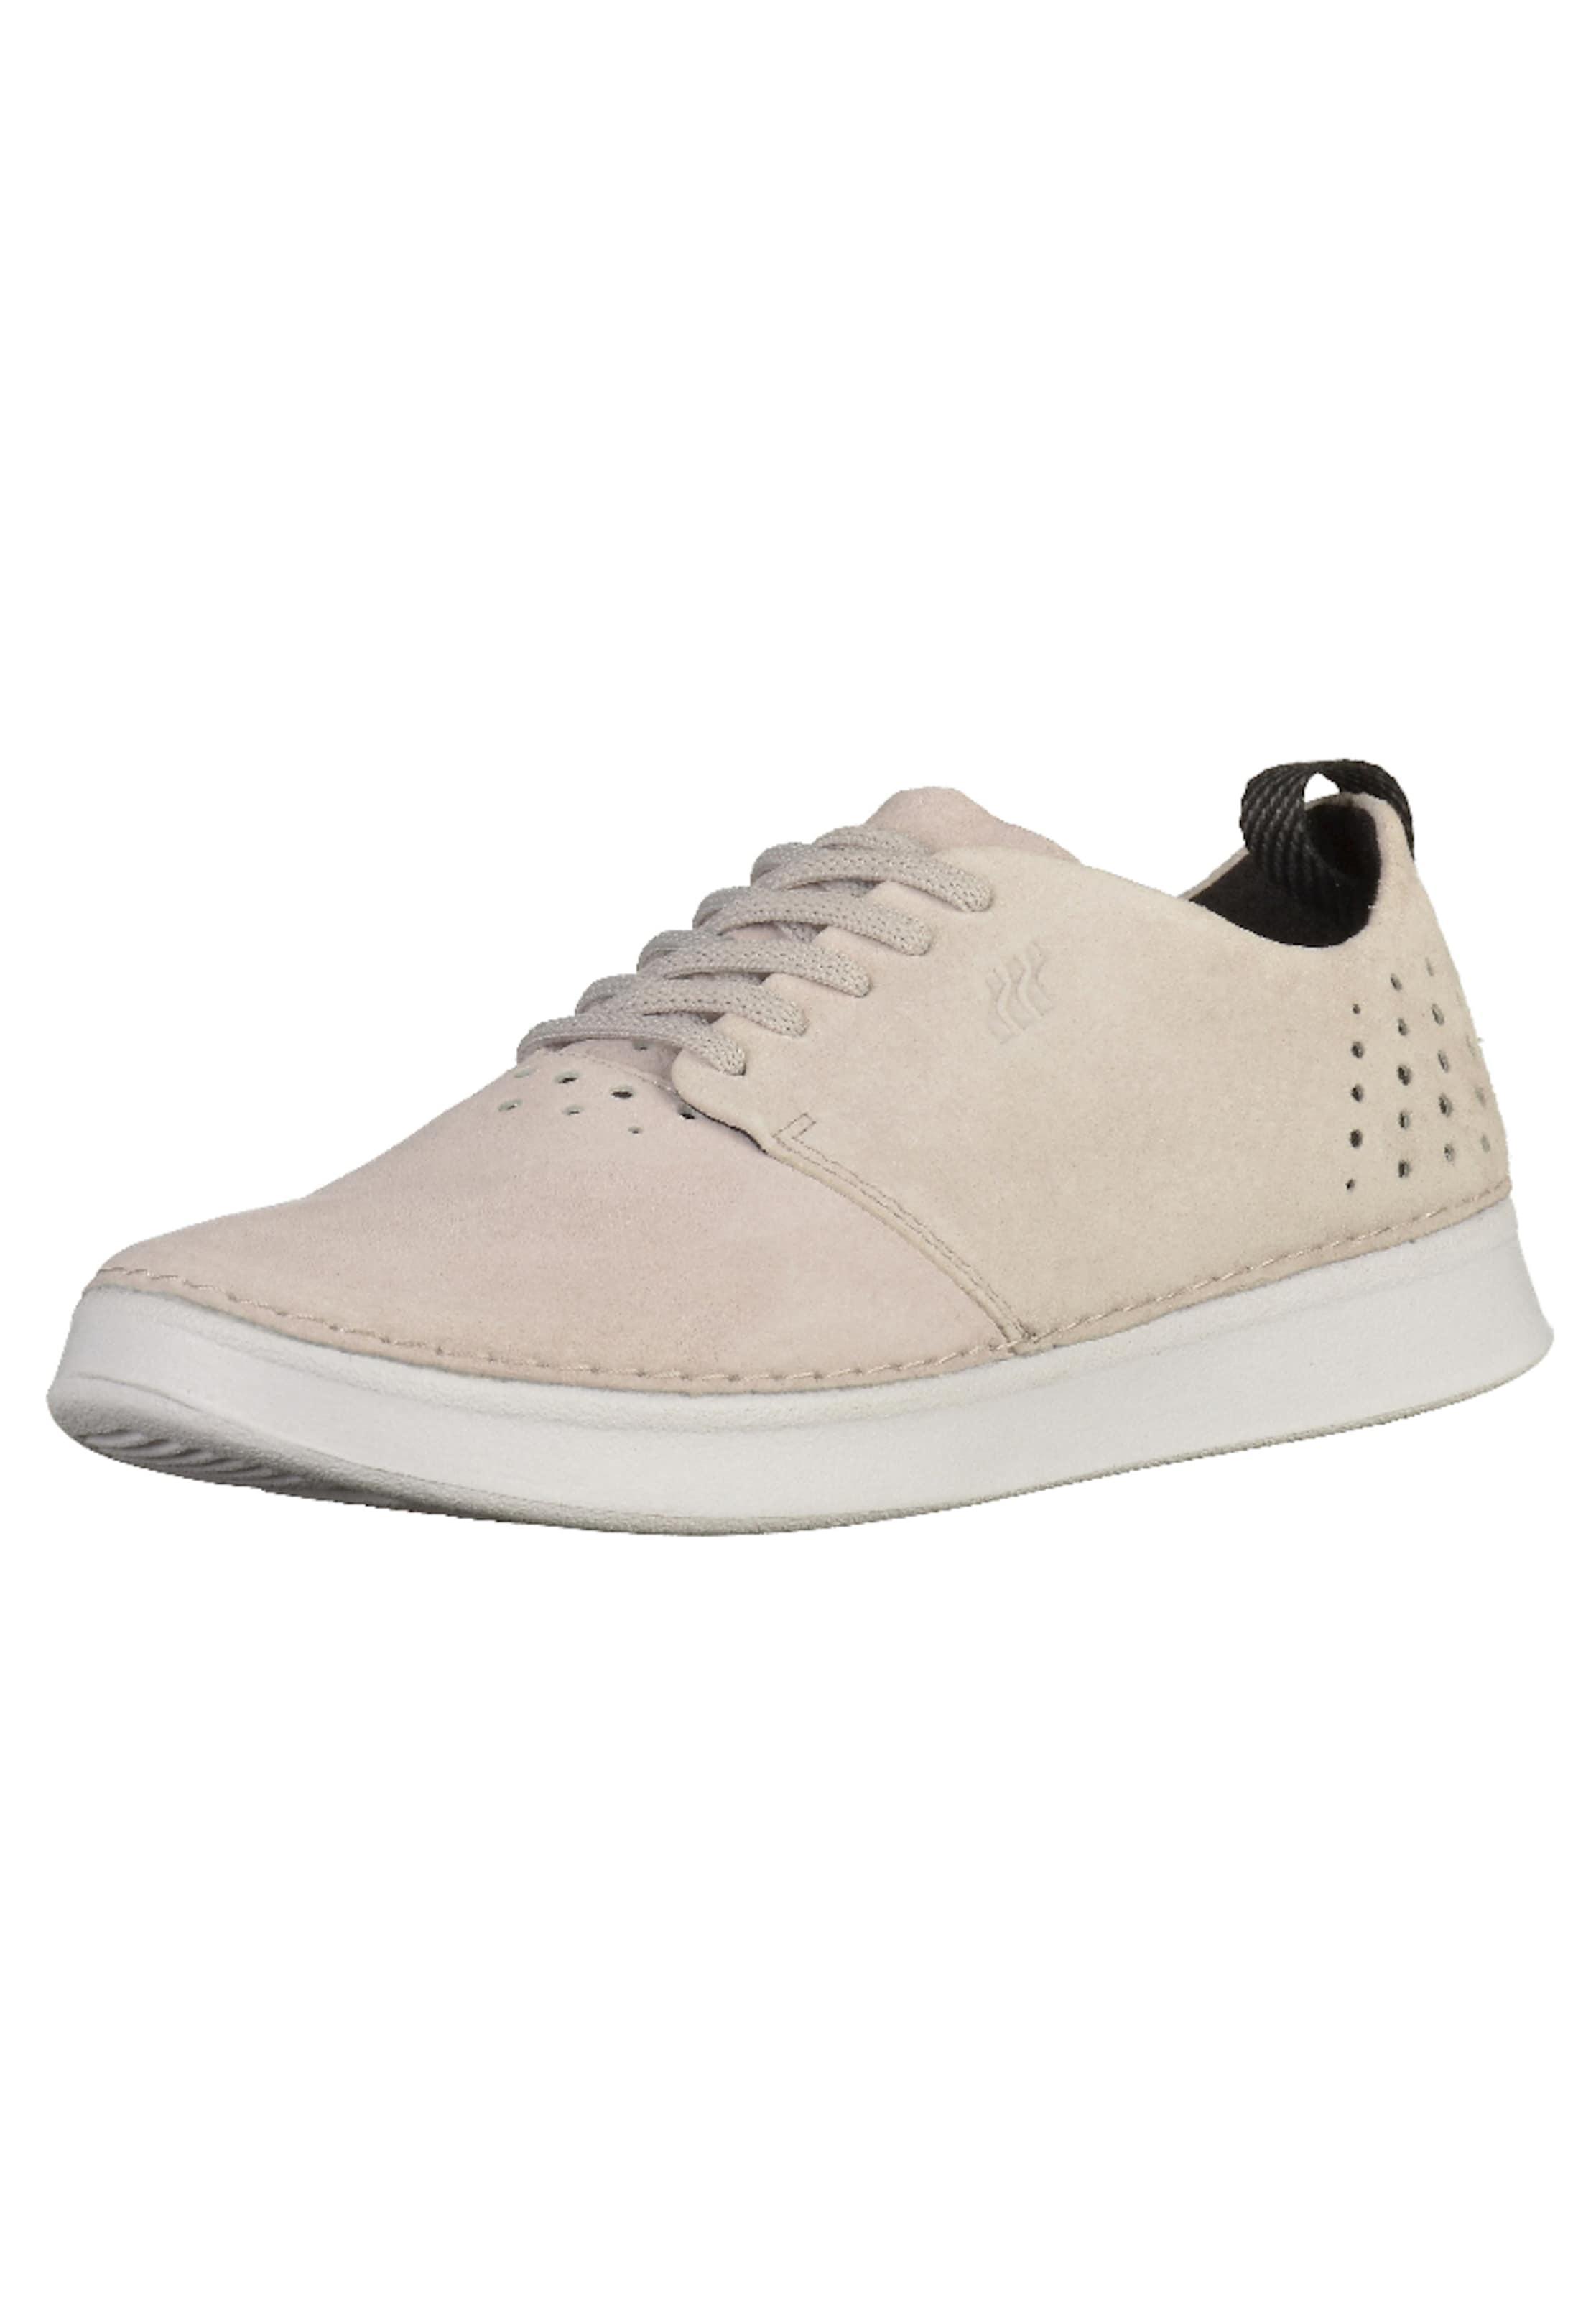 BOXFRESH Sneaker Günstige und langlebige Schuhe